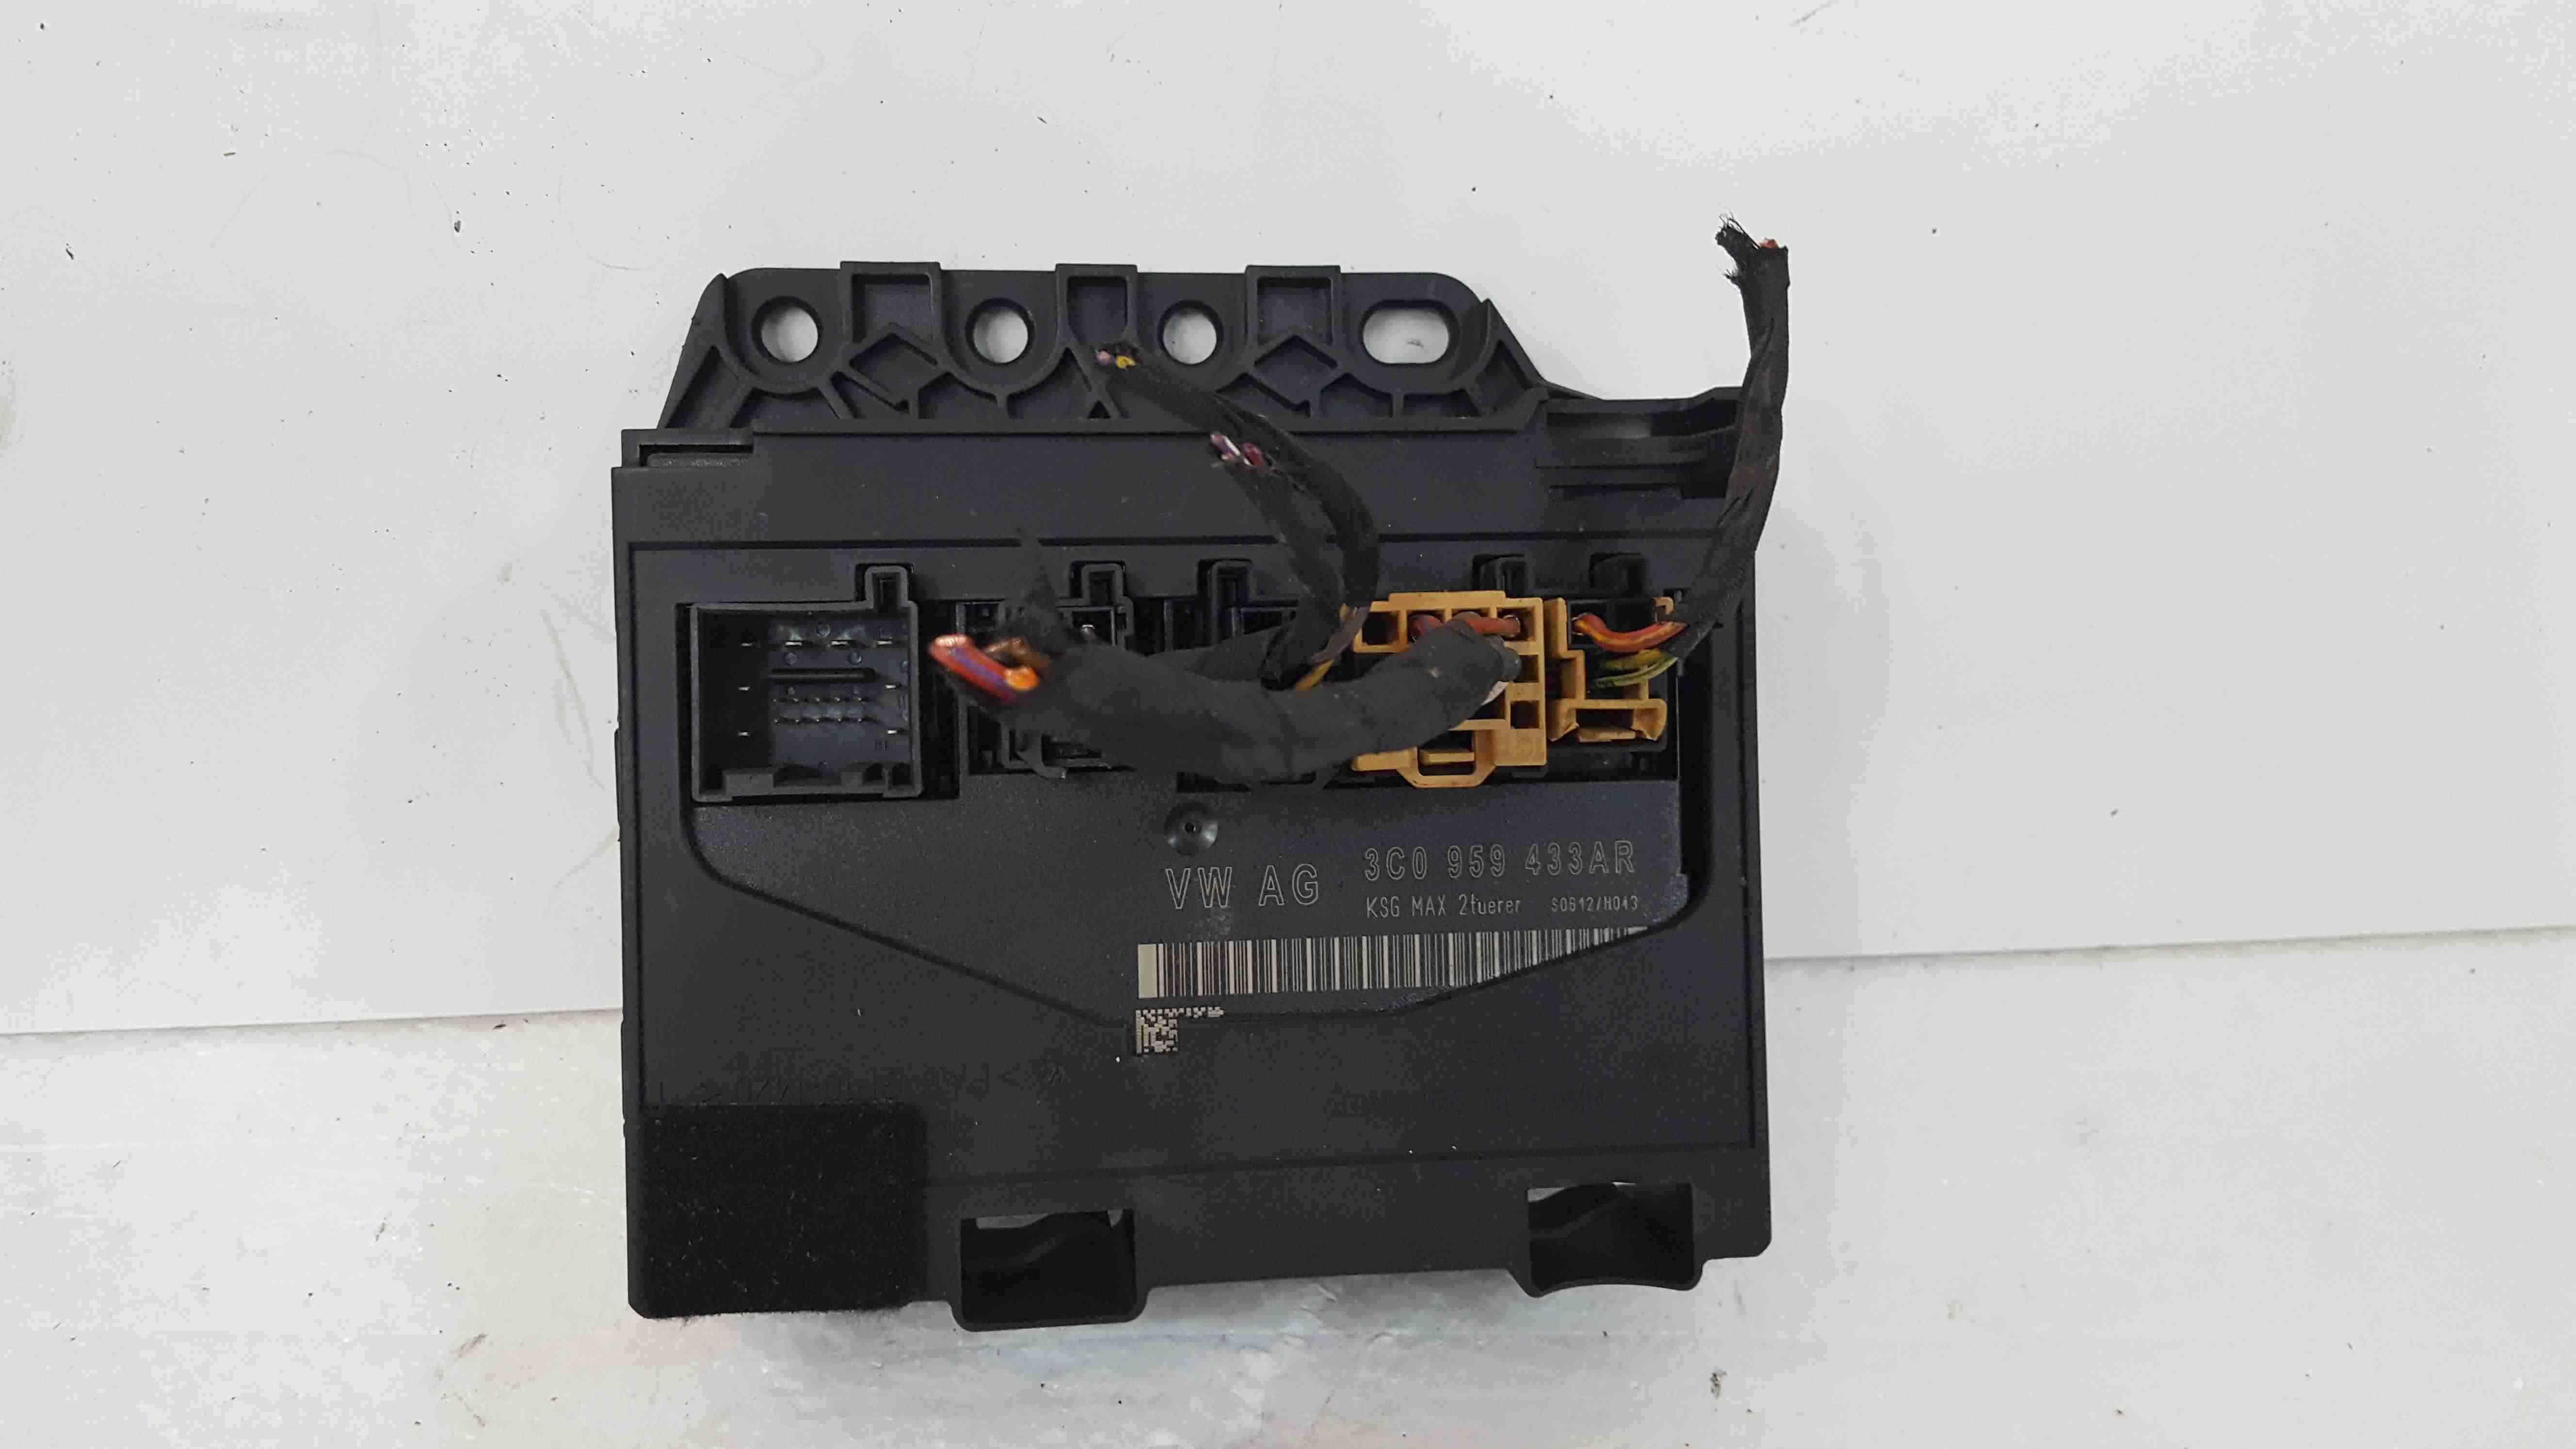 Volkswagen Passat B6 2005-2010 Comfort Convenience Module Unit ECU 3C0959433AR